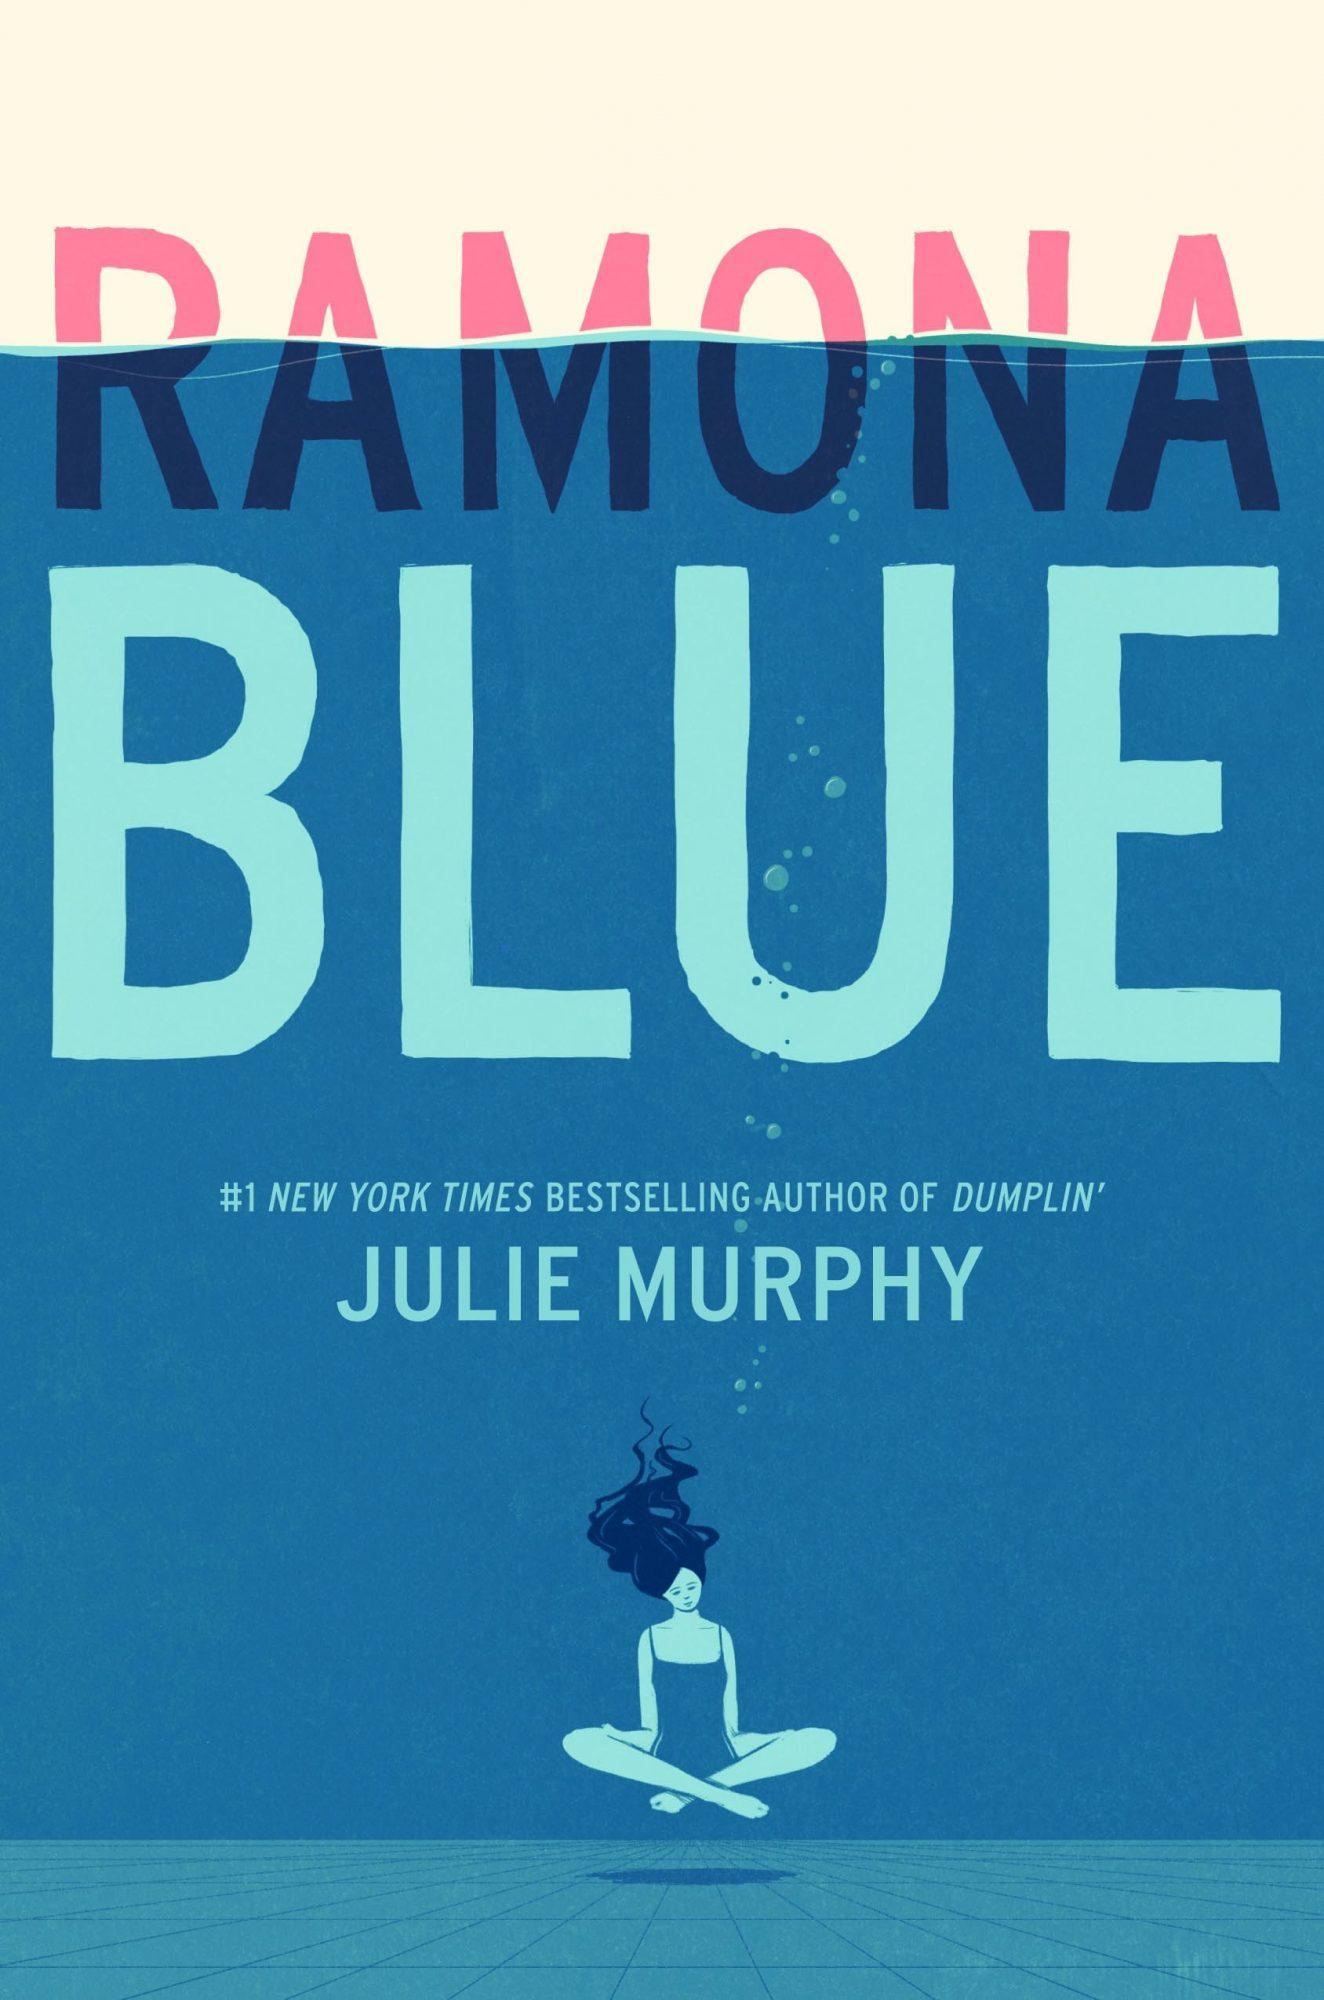 picture-of-ramona-blue-book-photo.jpg